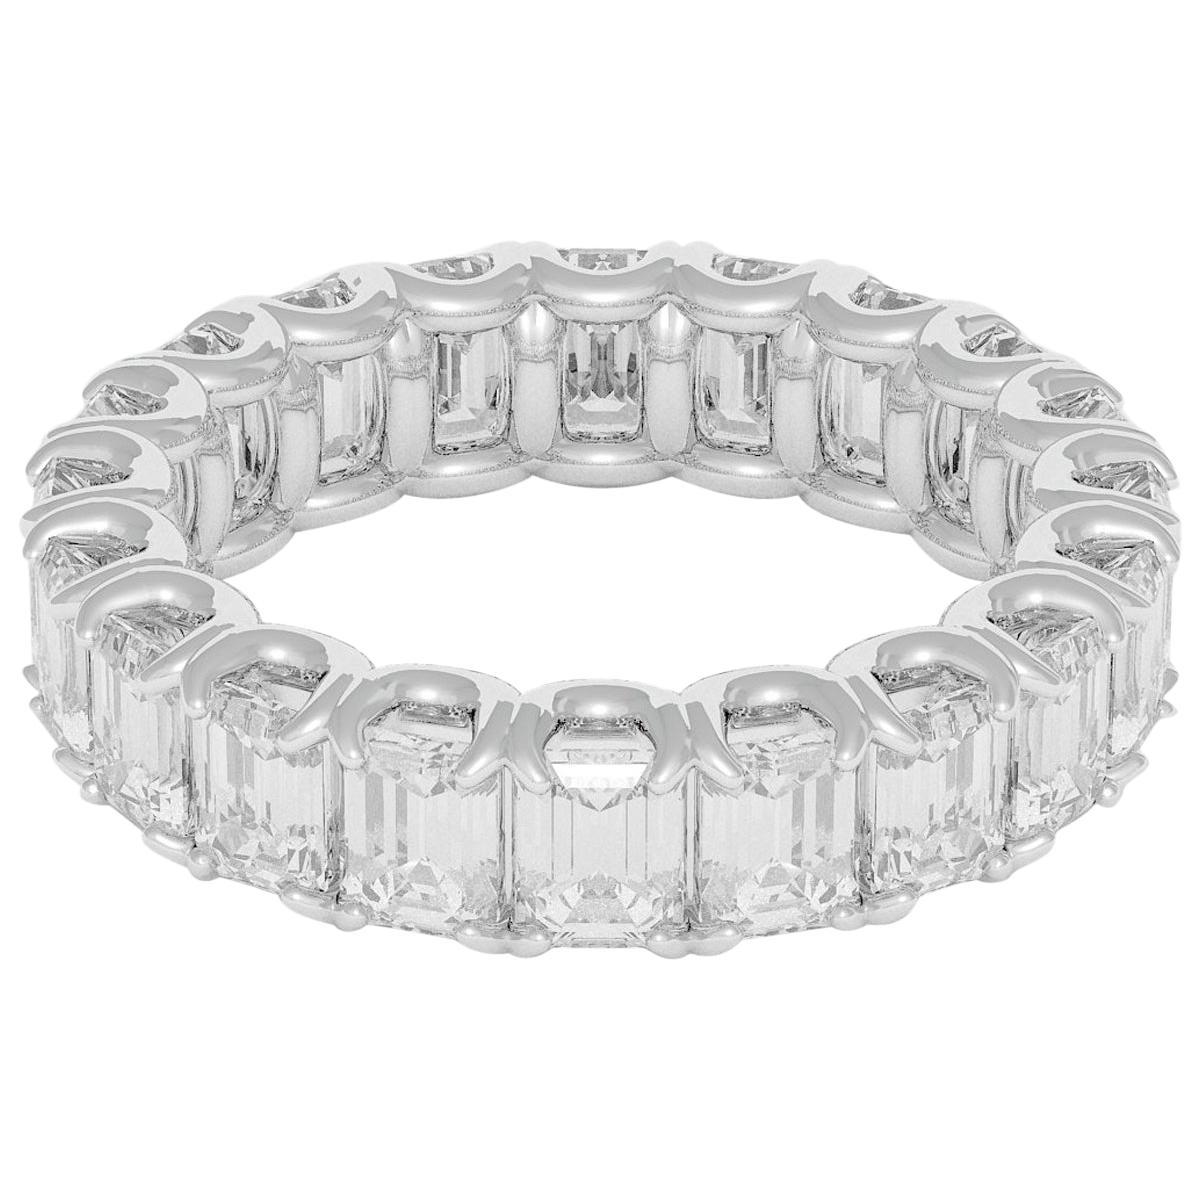 Emilio Jewelry 5.00 Carat Emerald Cut Diamond Eternity Platinum Band